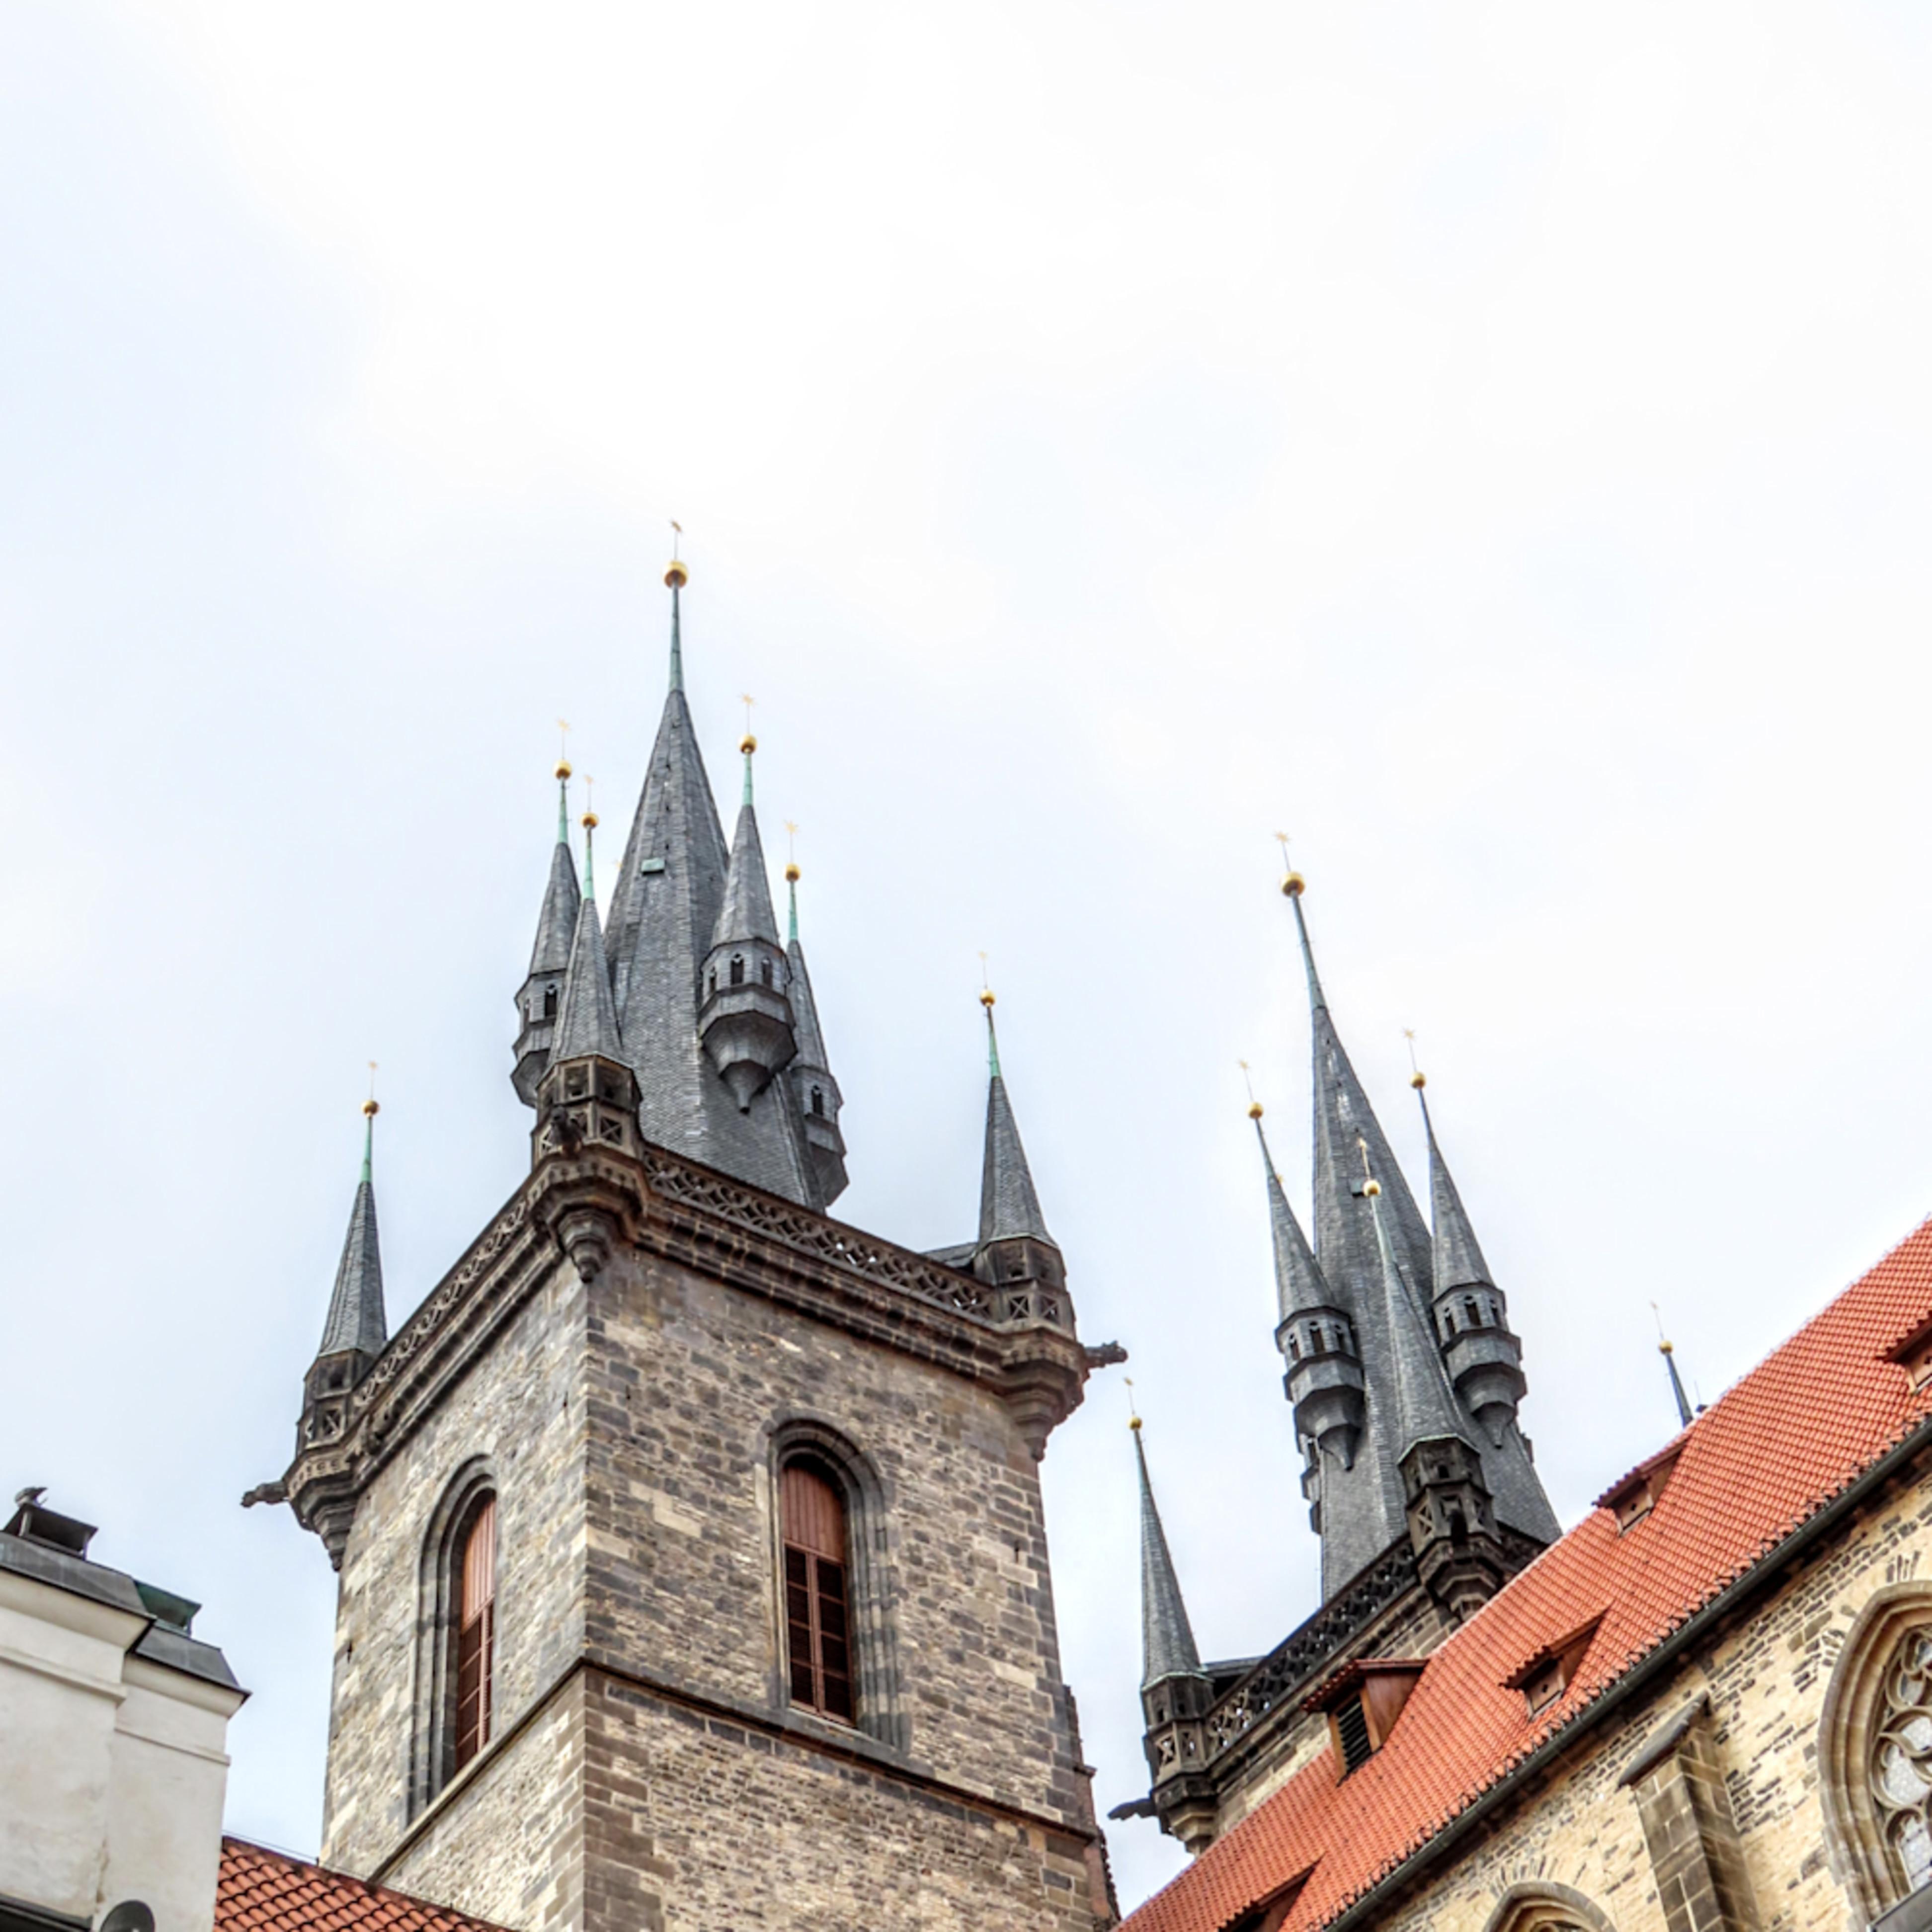 Praguemagicnumber3 popmed img 0432 lq9hii